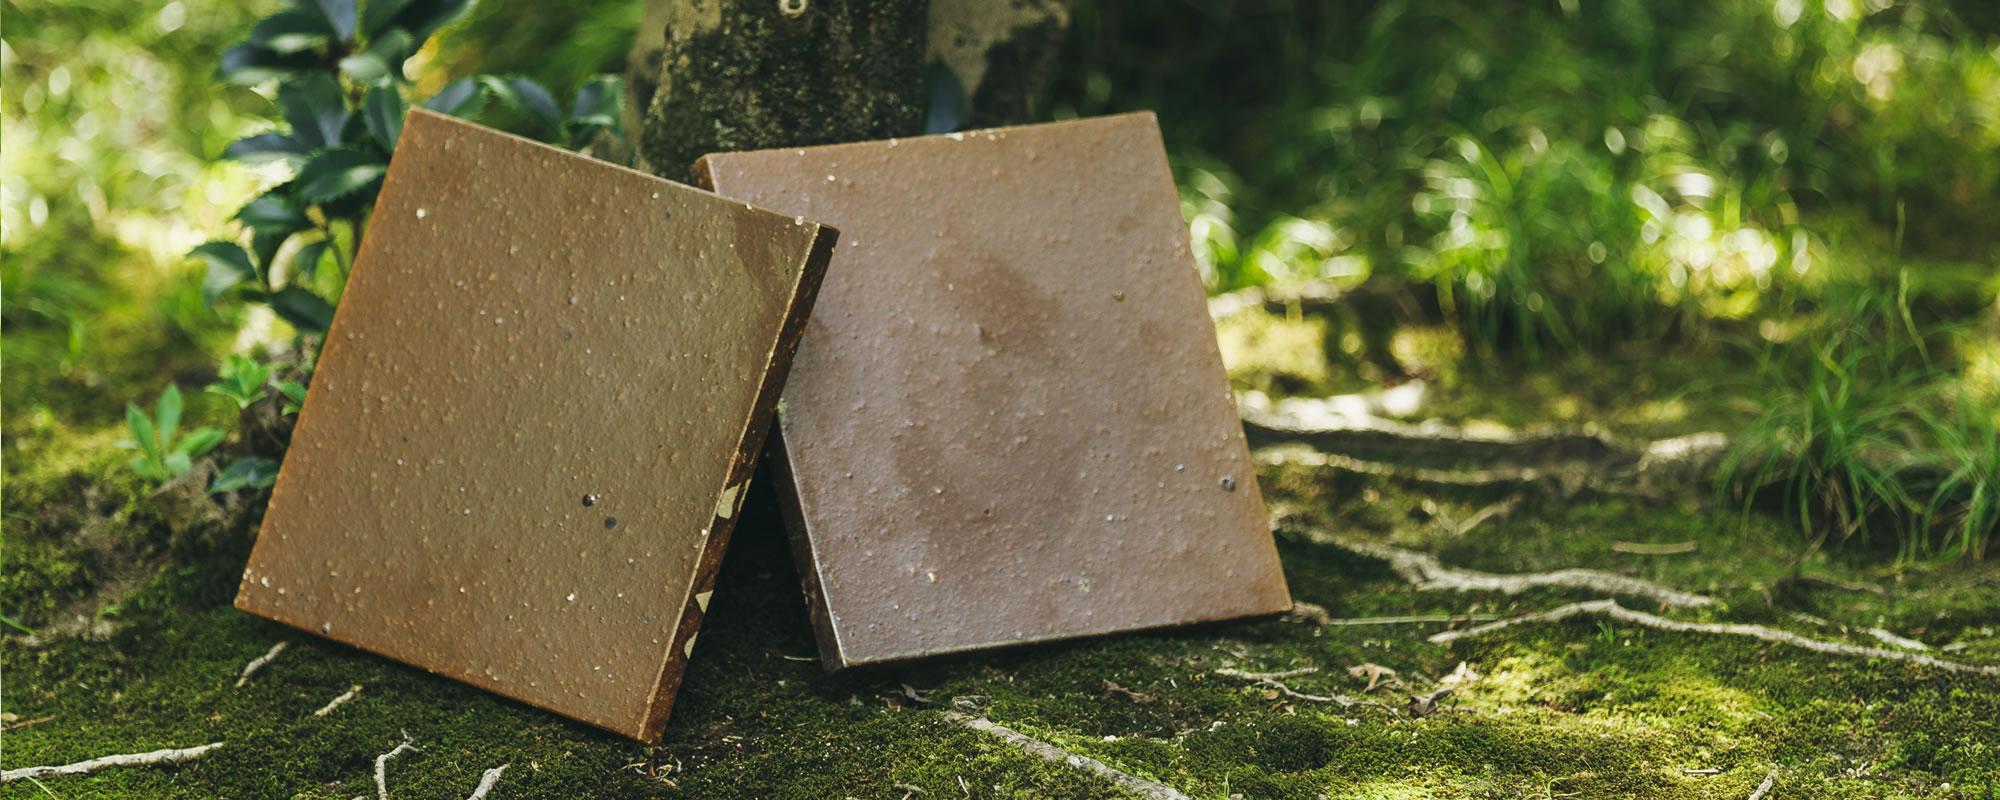 kernは、趣のある陶板タイルを製造販売しています